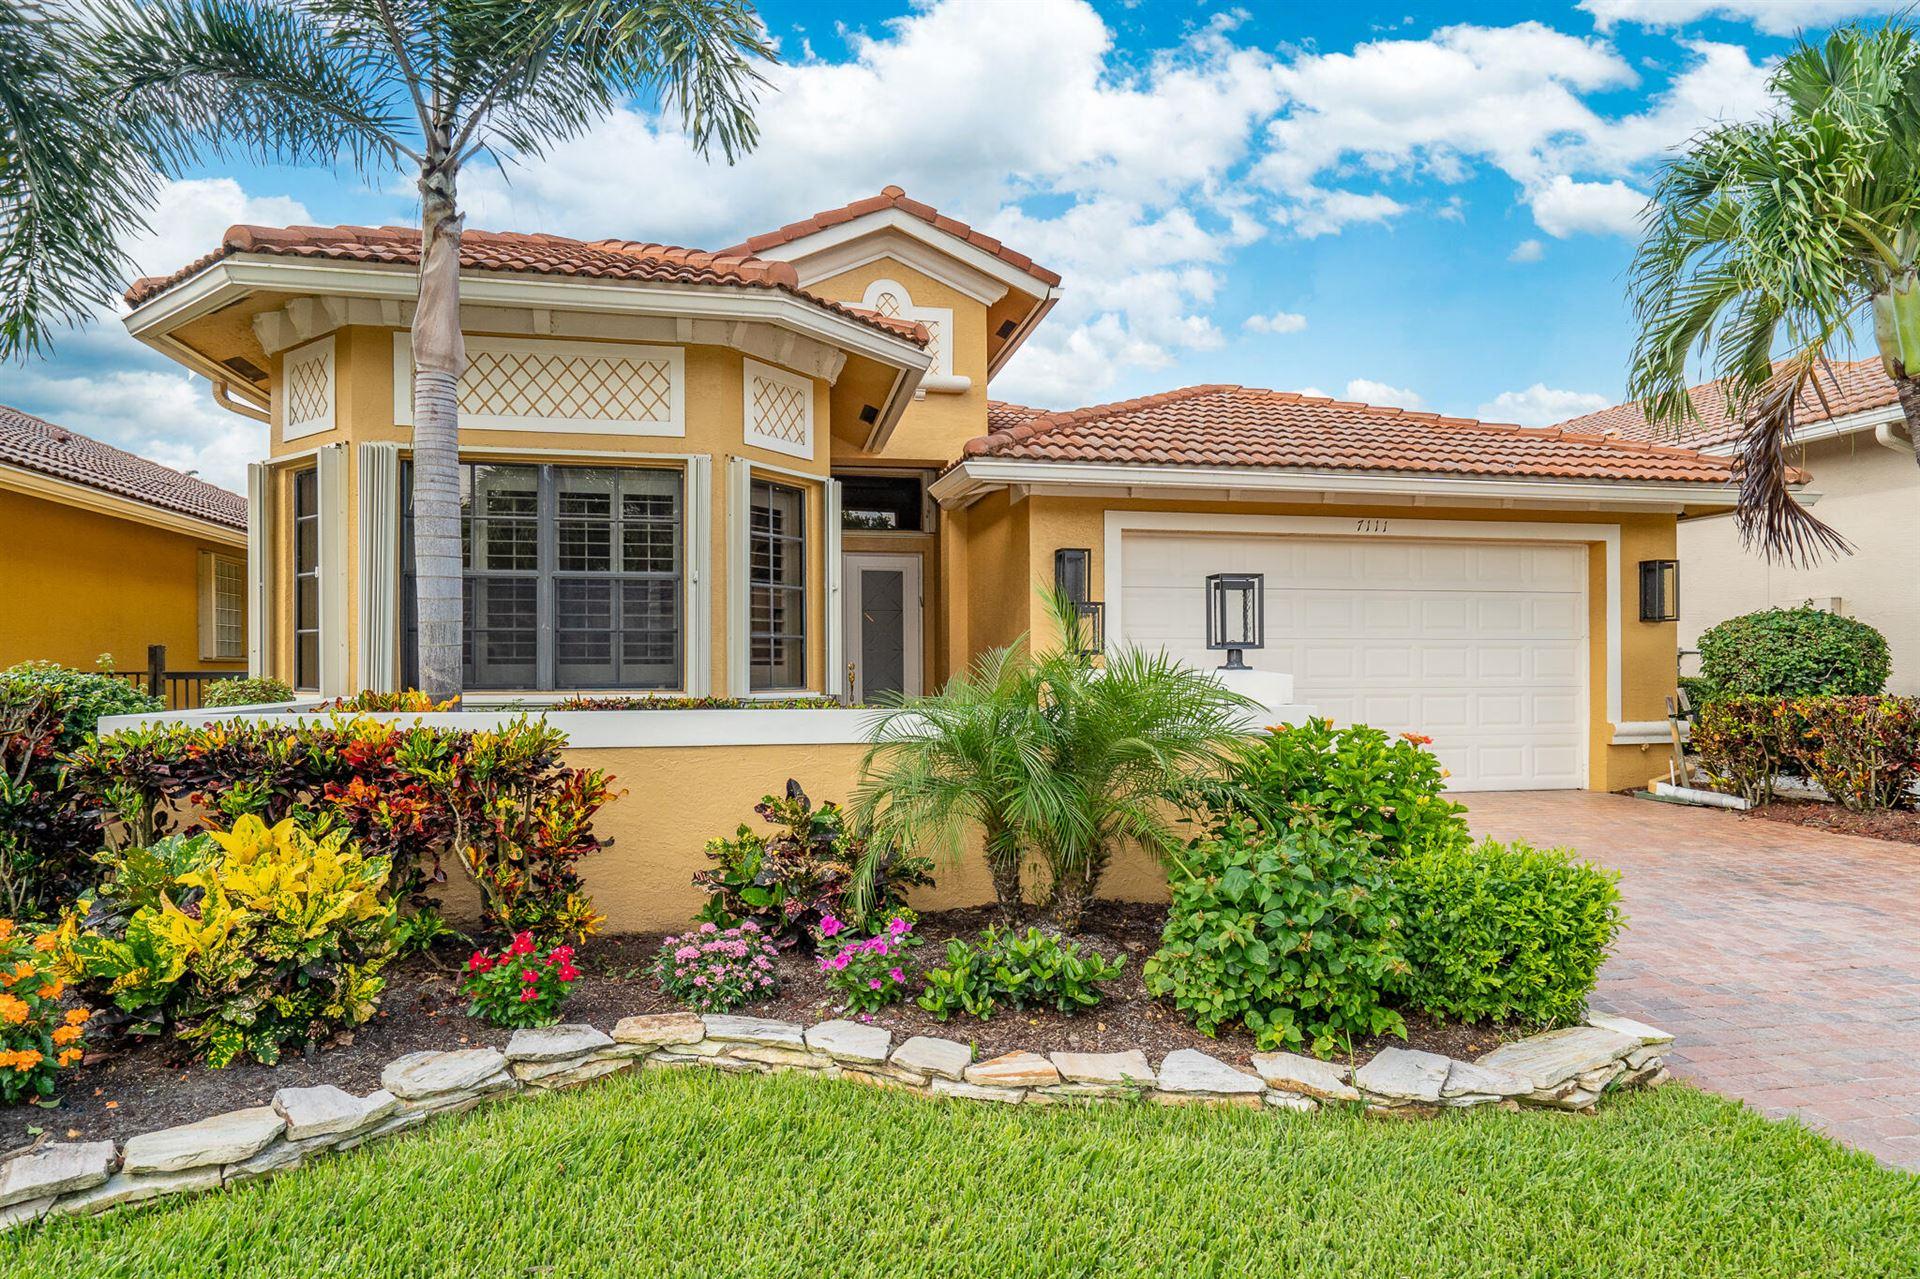 7111 Boscanni Drive, Boynton Beach, FL 33437 - MLS#: RX-10732653